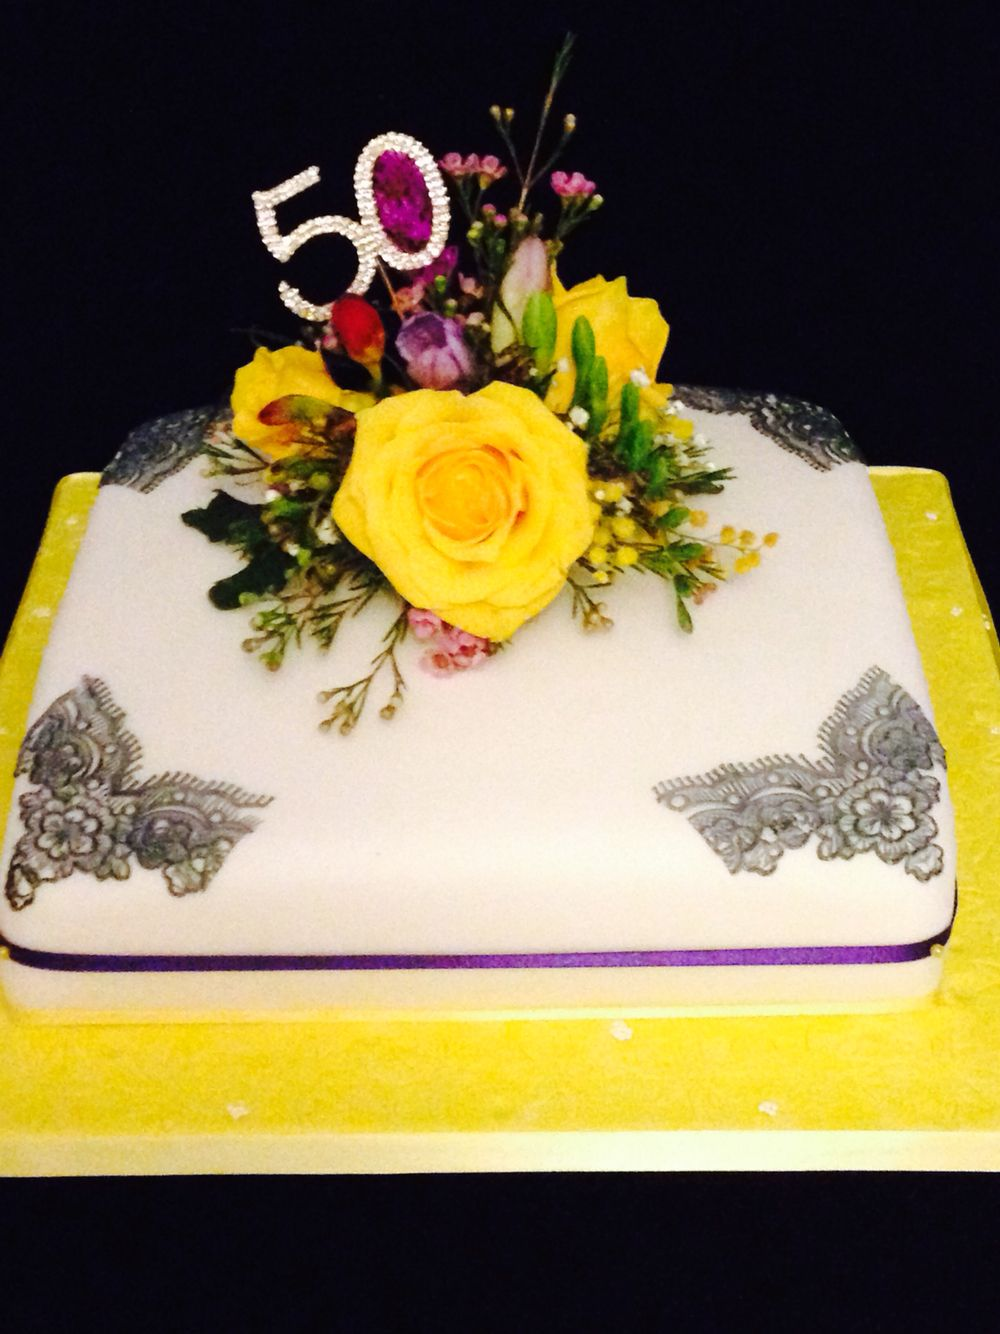 50th birthday cake displaying a beautiful bouquet of flowers simple 50th birthday cake displaying a beautiful bouquet of flowers simple but elegant izmirmasajfo